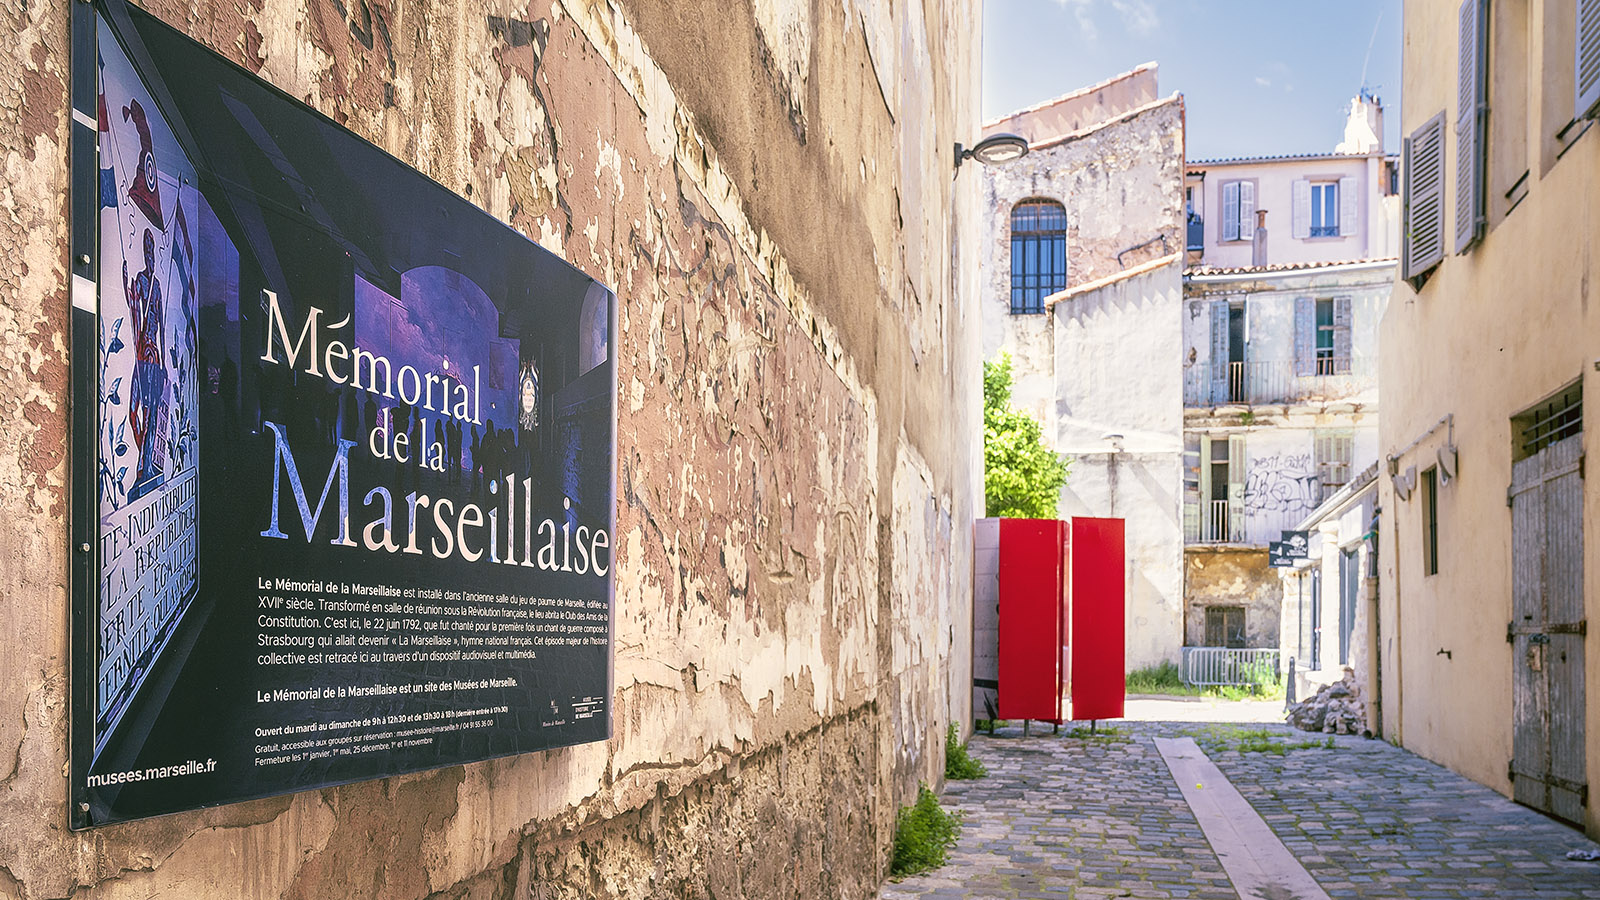 Memorial de la Marseillaise. Foto: Hilke Maunder